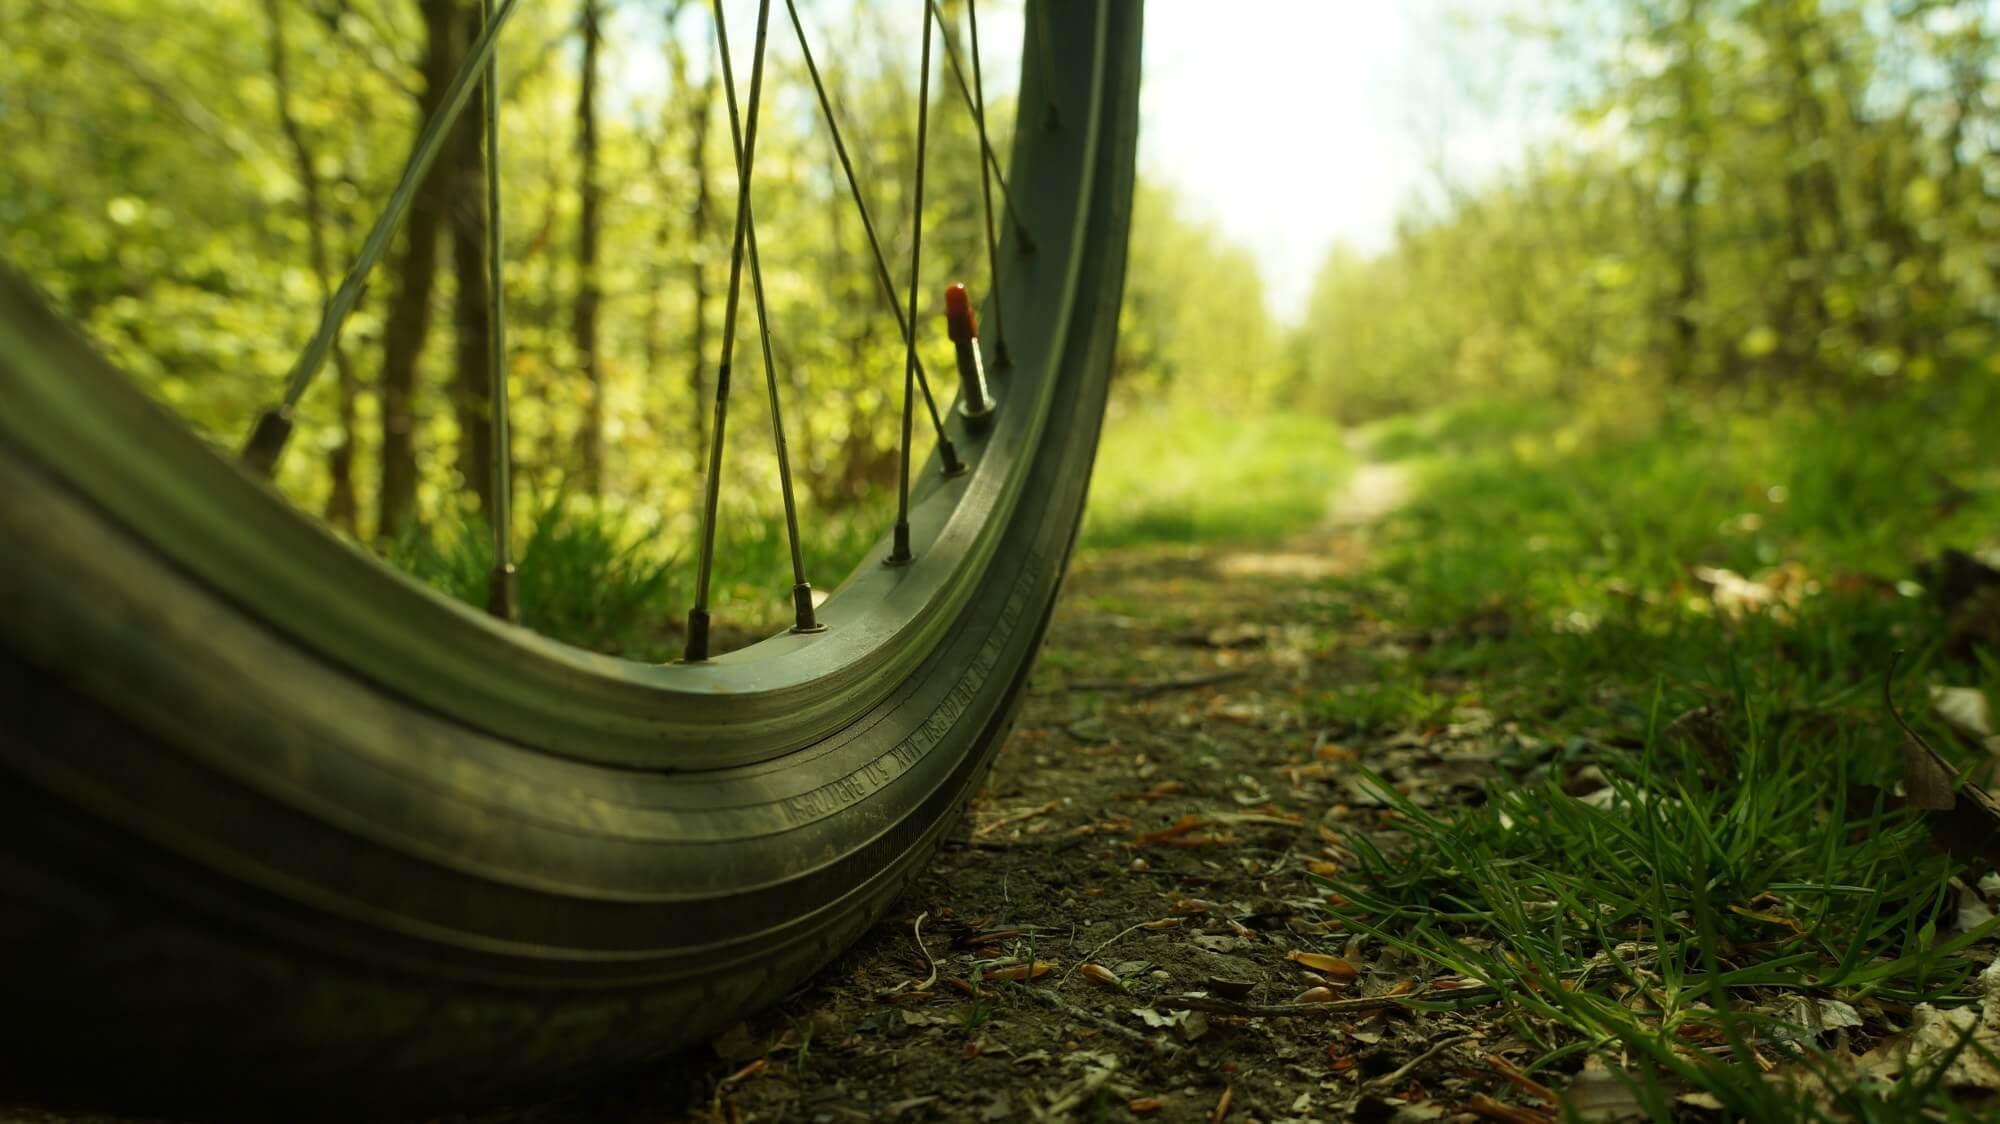 gory-sowie-rowerem-na-weekend-26